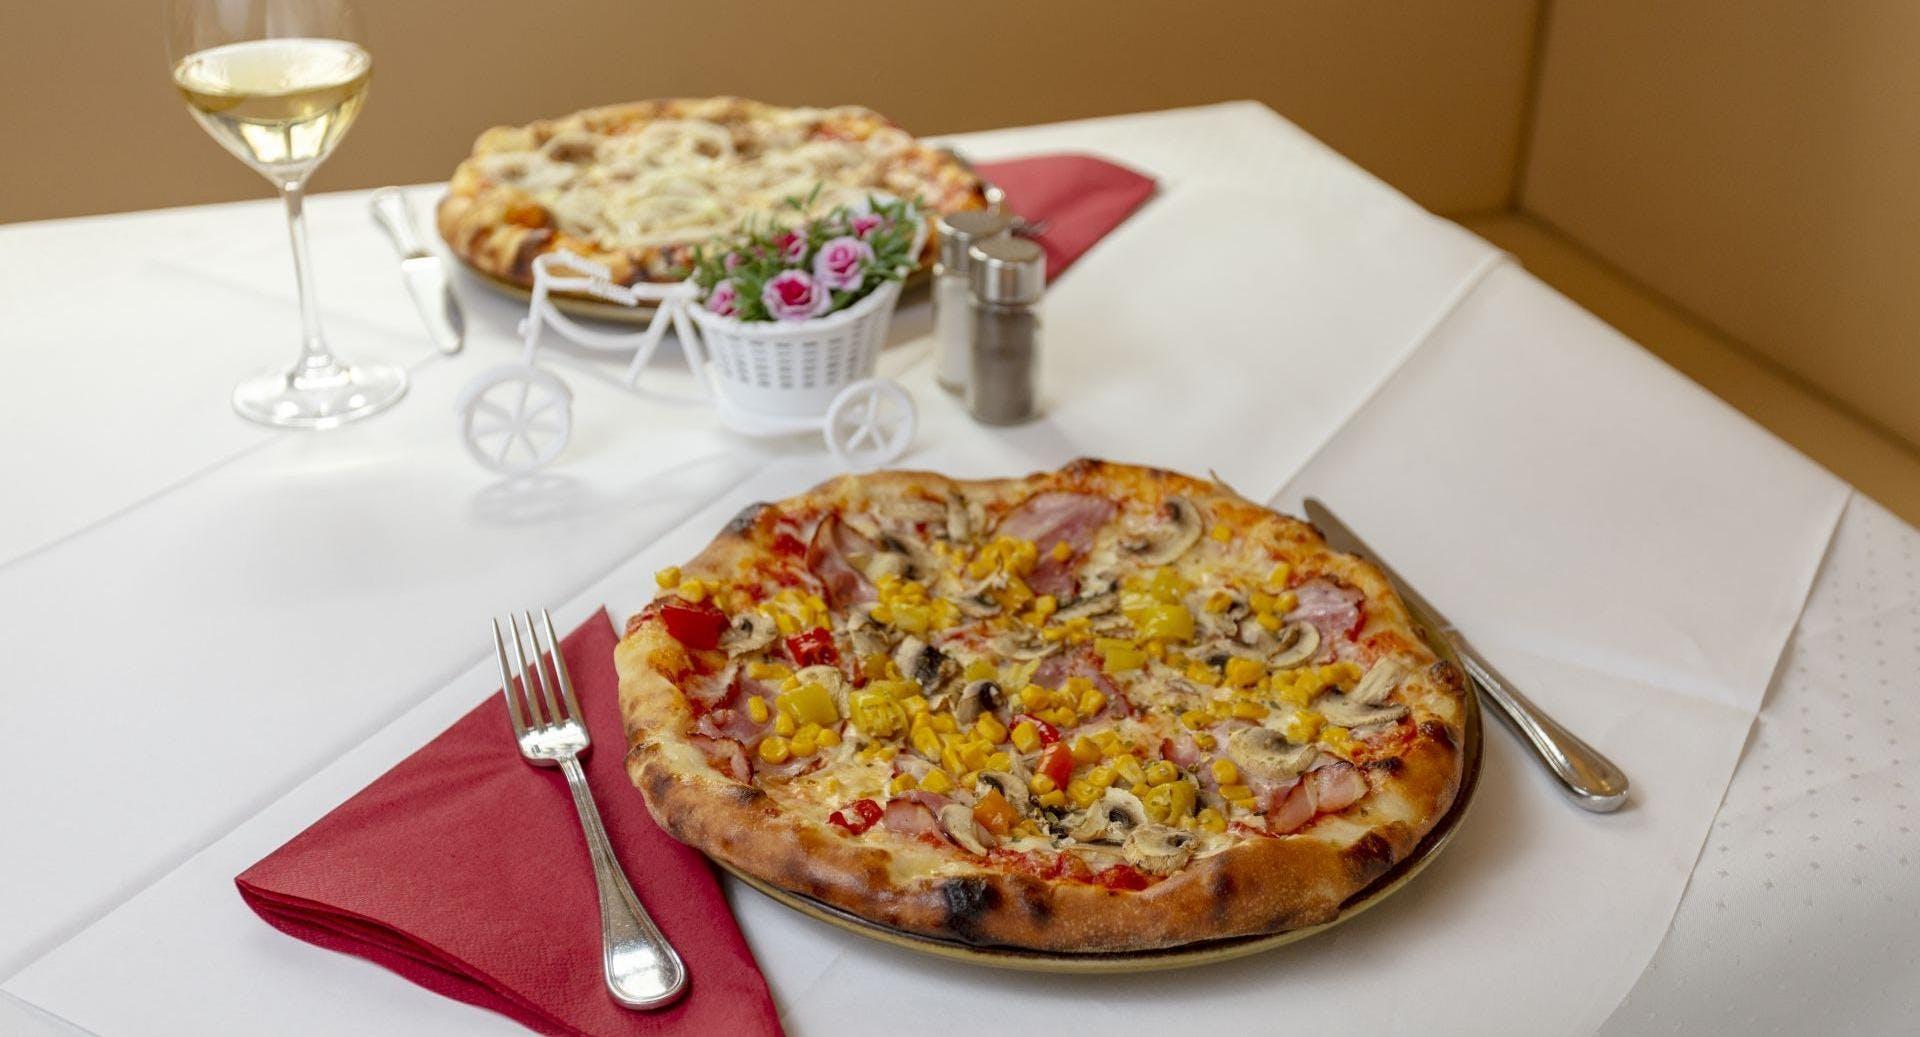 Pizzeria Santa Lucia Wien image 2